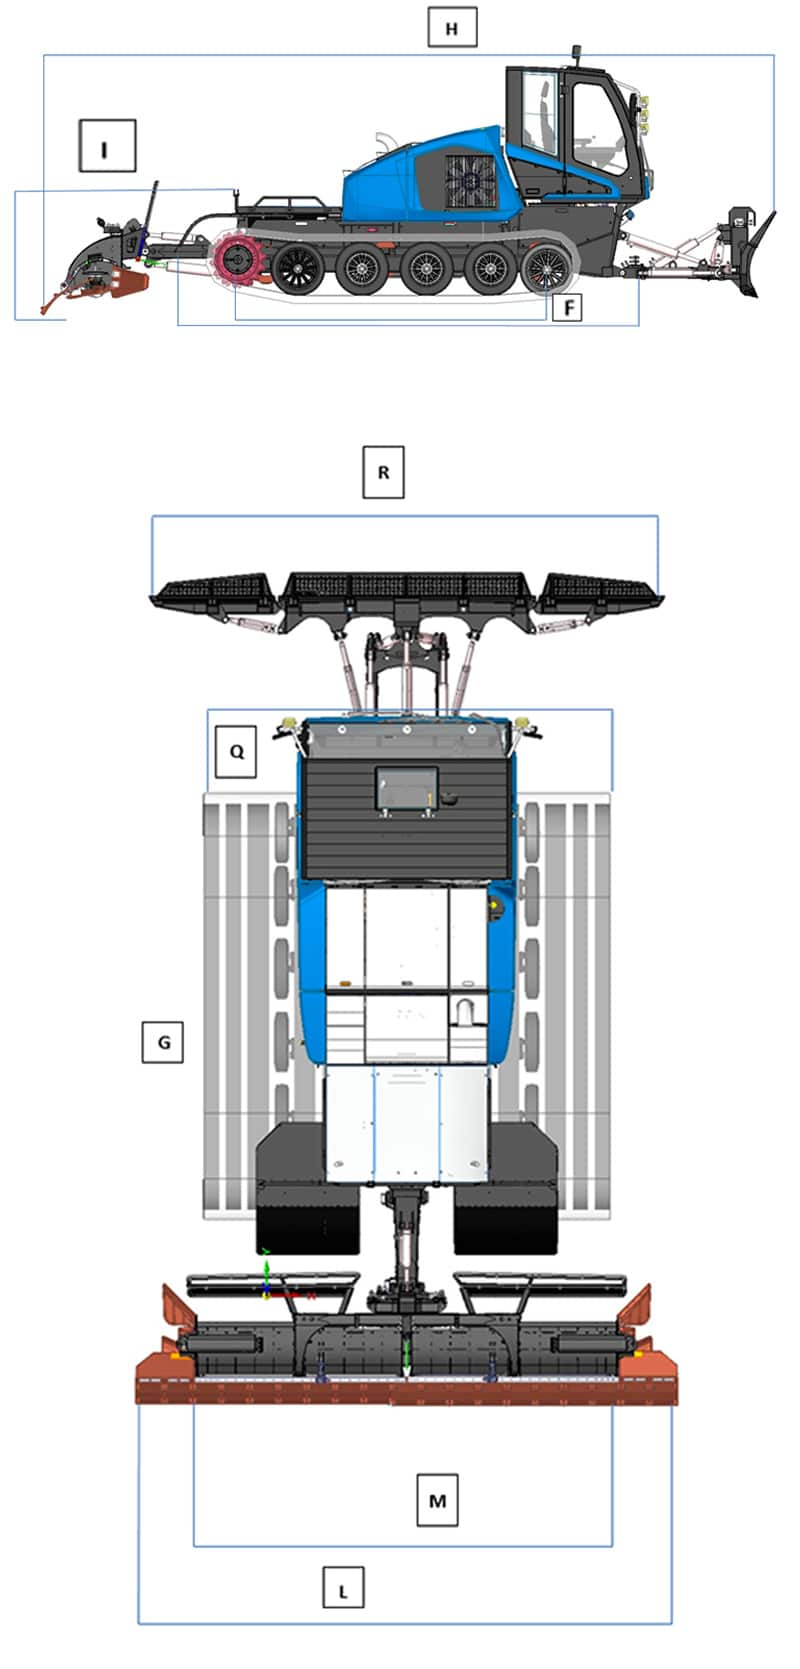 Alpine 510 - CM Dupon Dameuse-groomer-machine-cm-dupon-alpine-510-dimensions-c